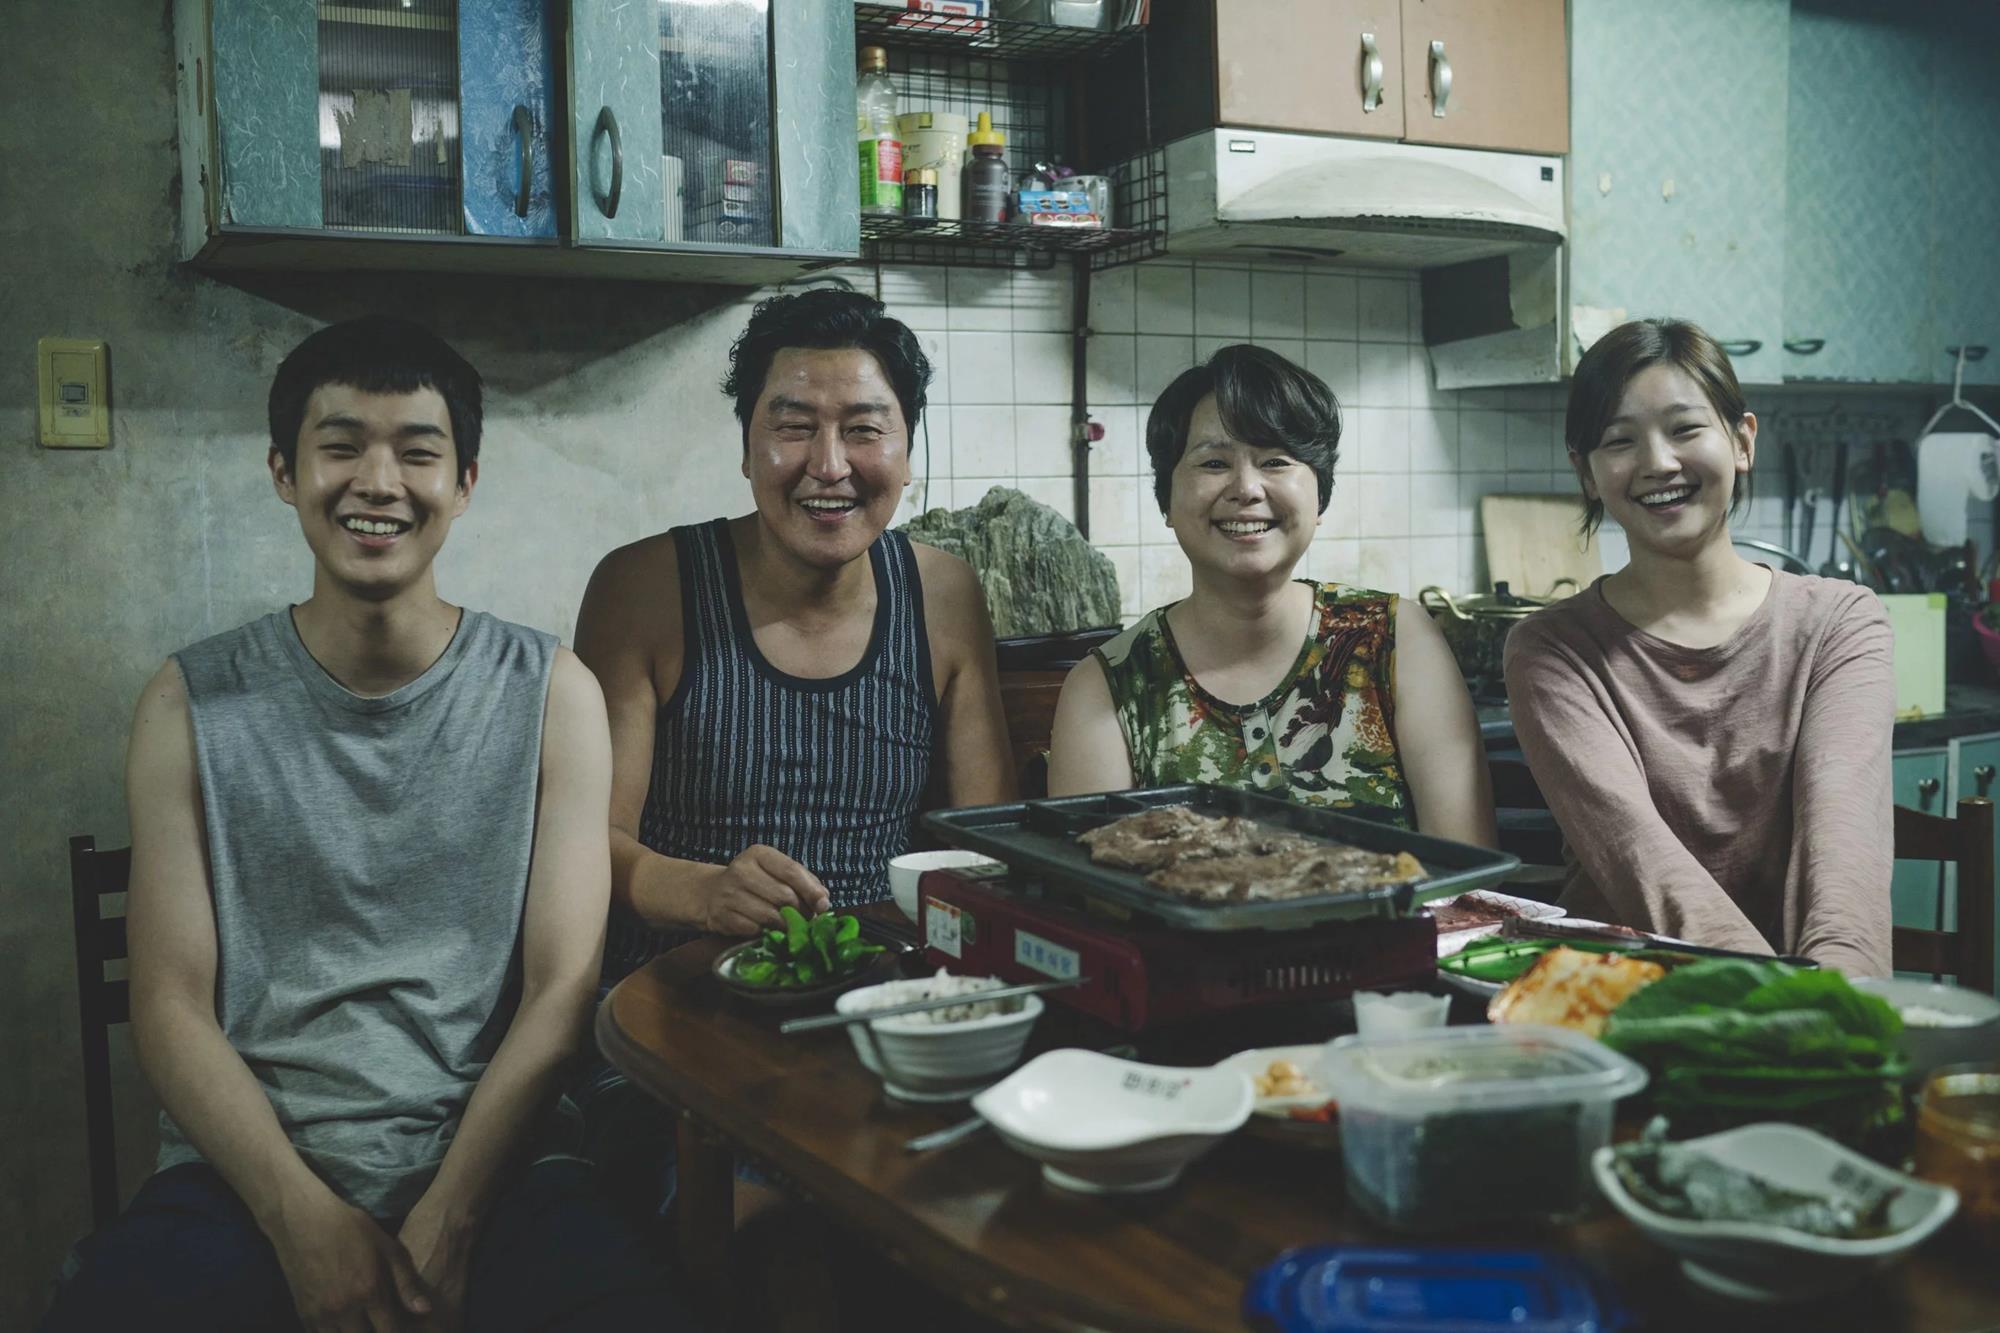 La taquilla le sonríe a la oscarizada Parasite de Bong Joon-Ho